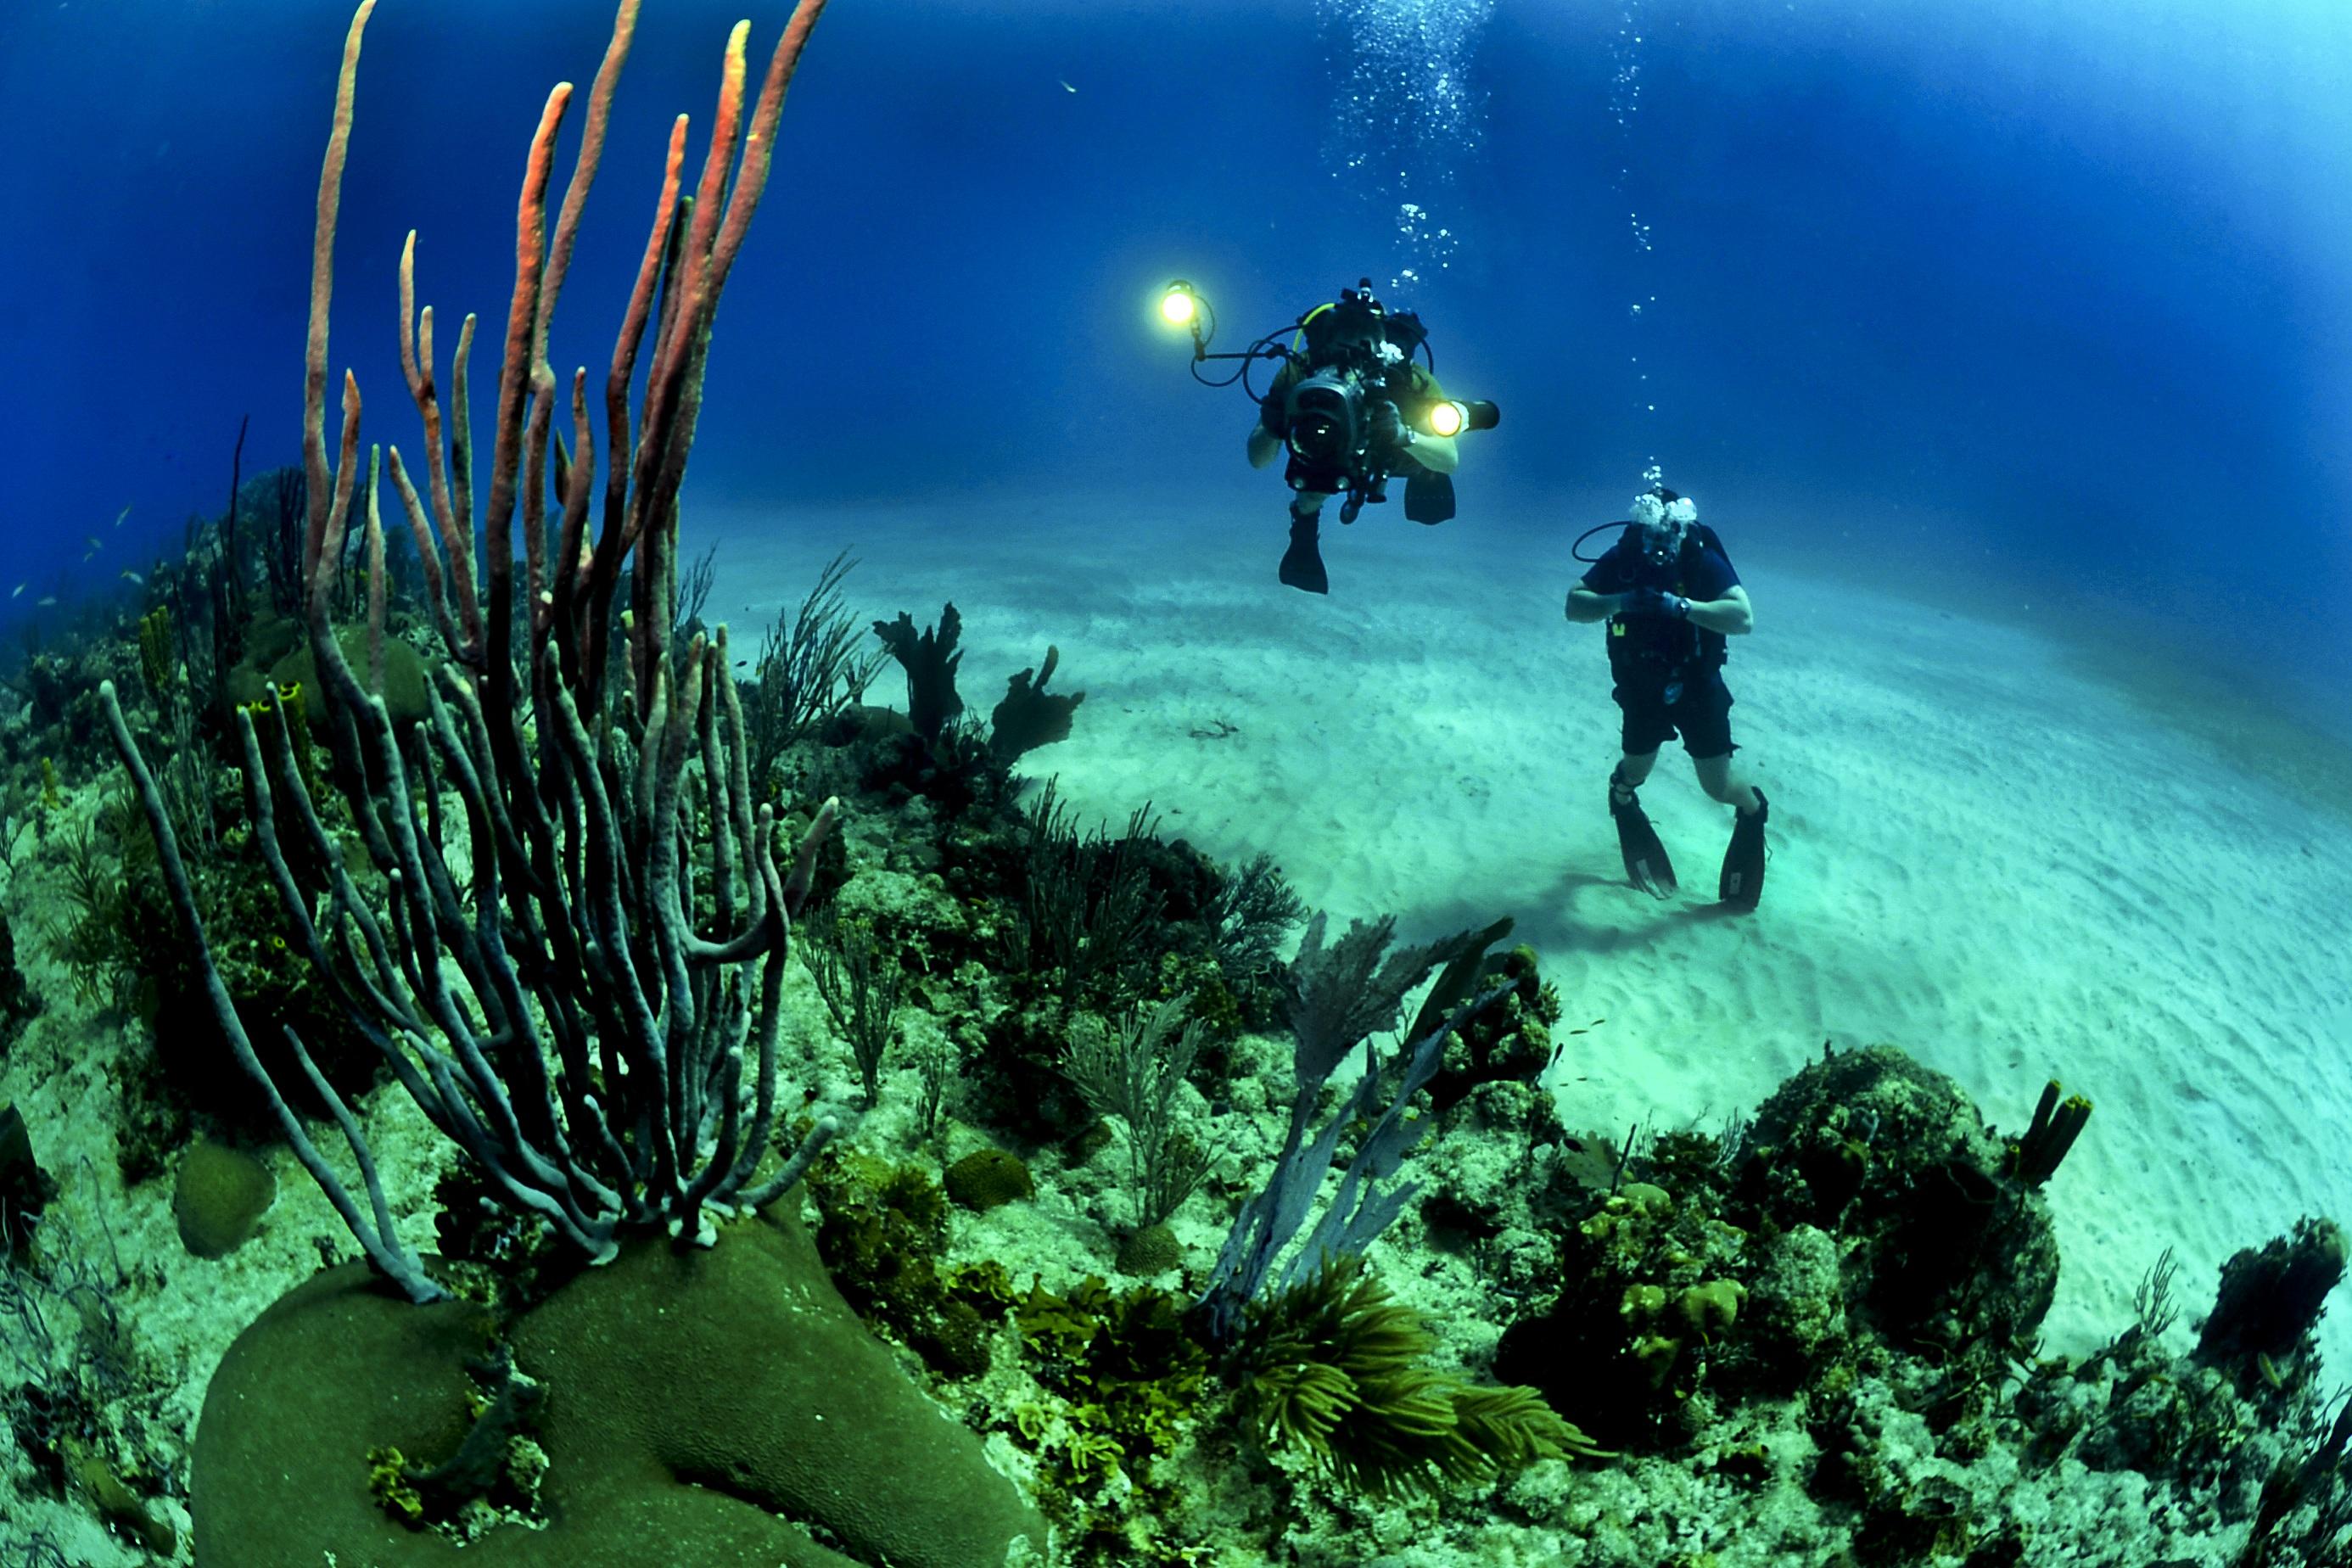 underwater ghost nets posing threat to marine ecosystem